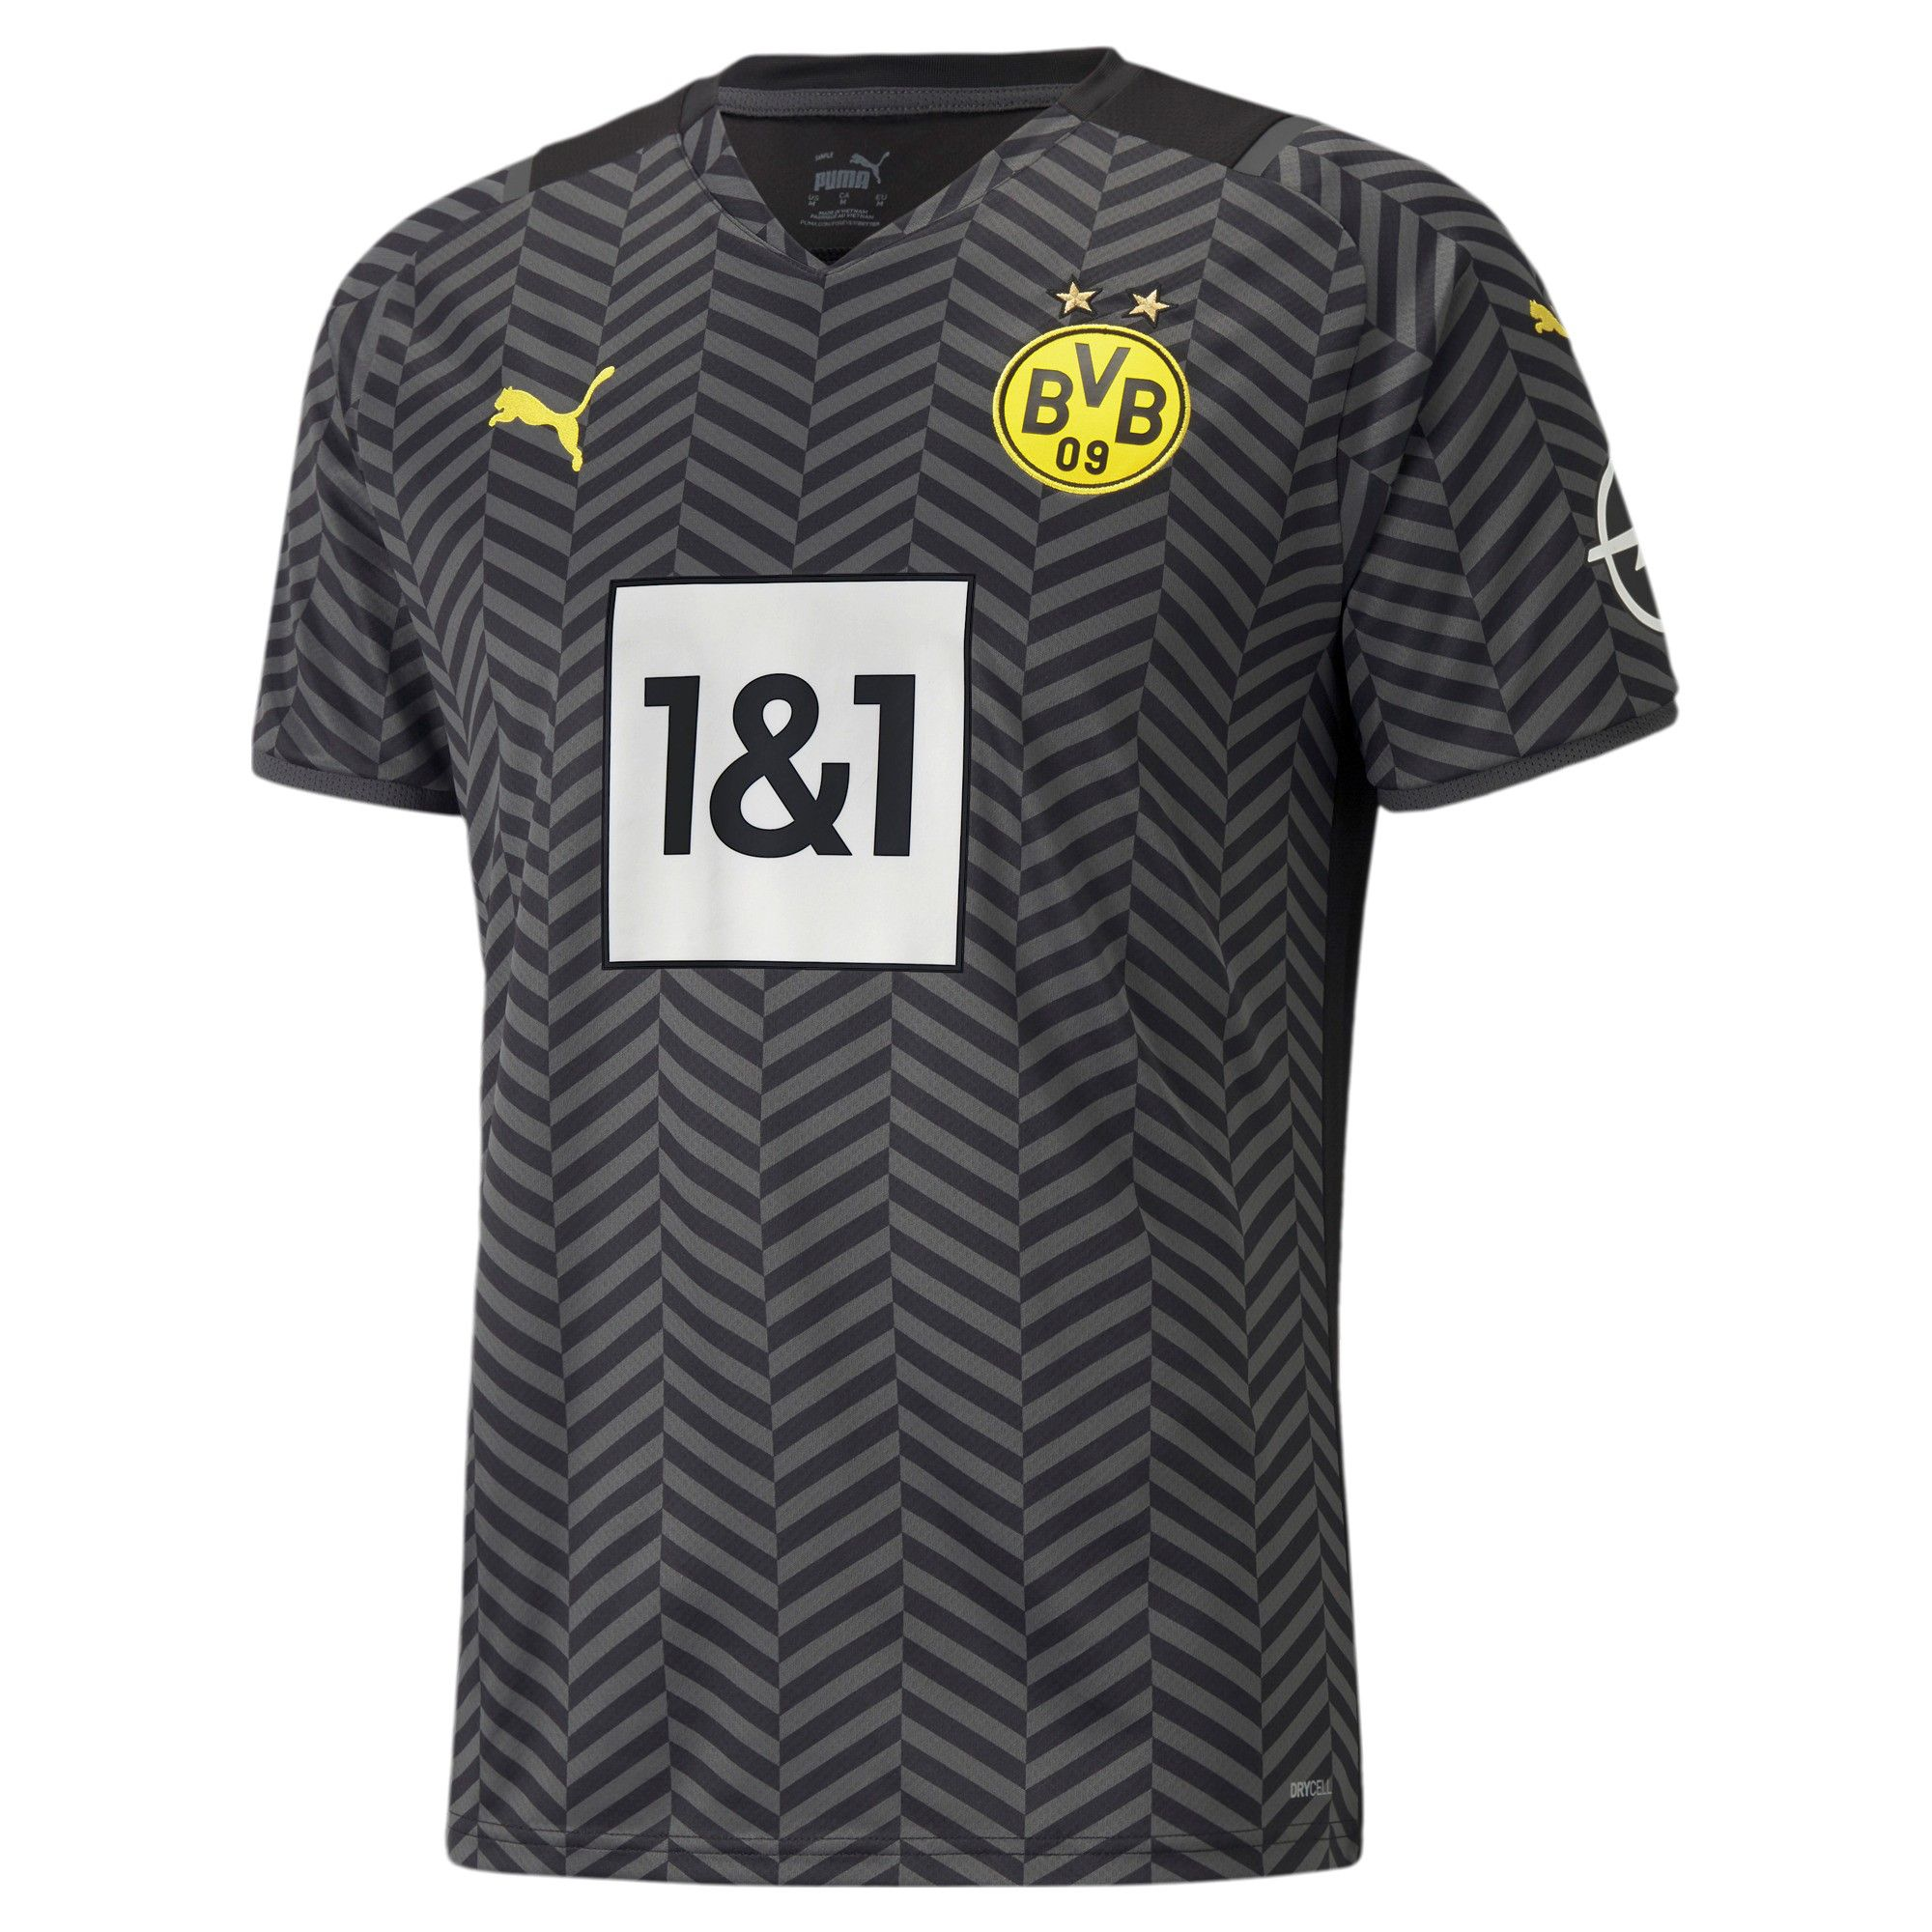 PUMA Borussia Dortmund Uitshirt 2021-2022